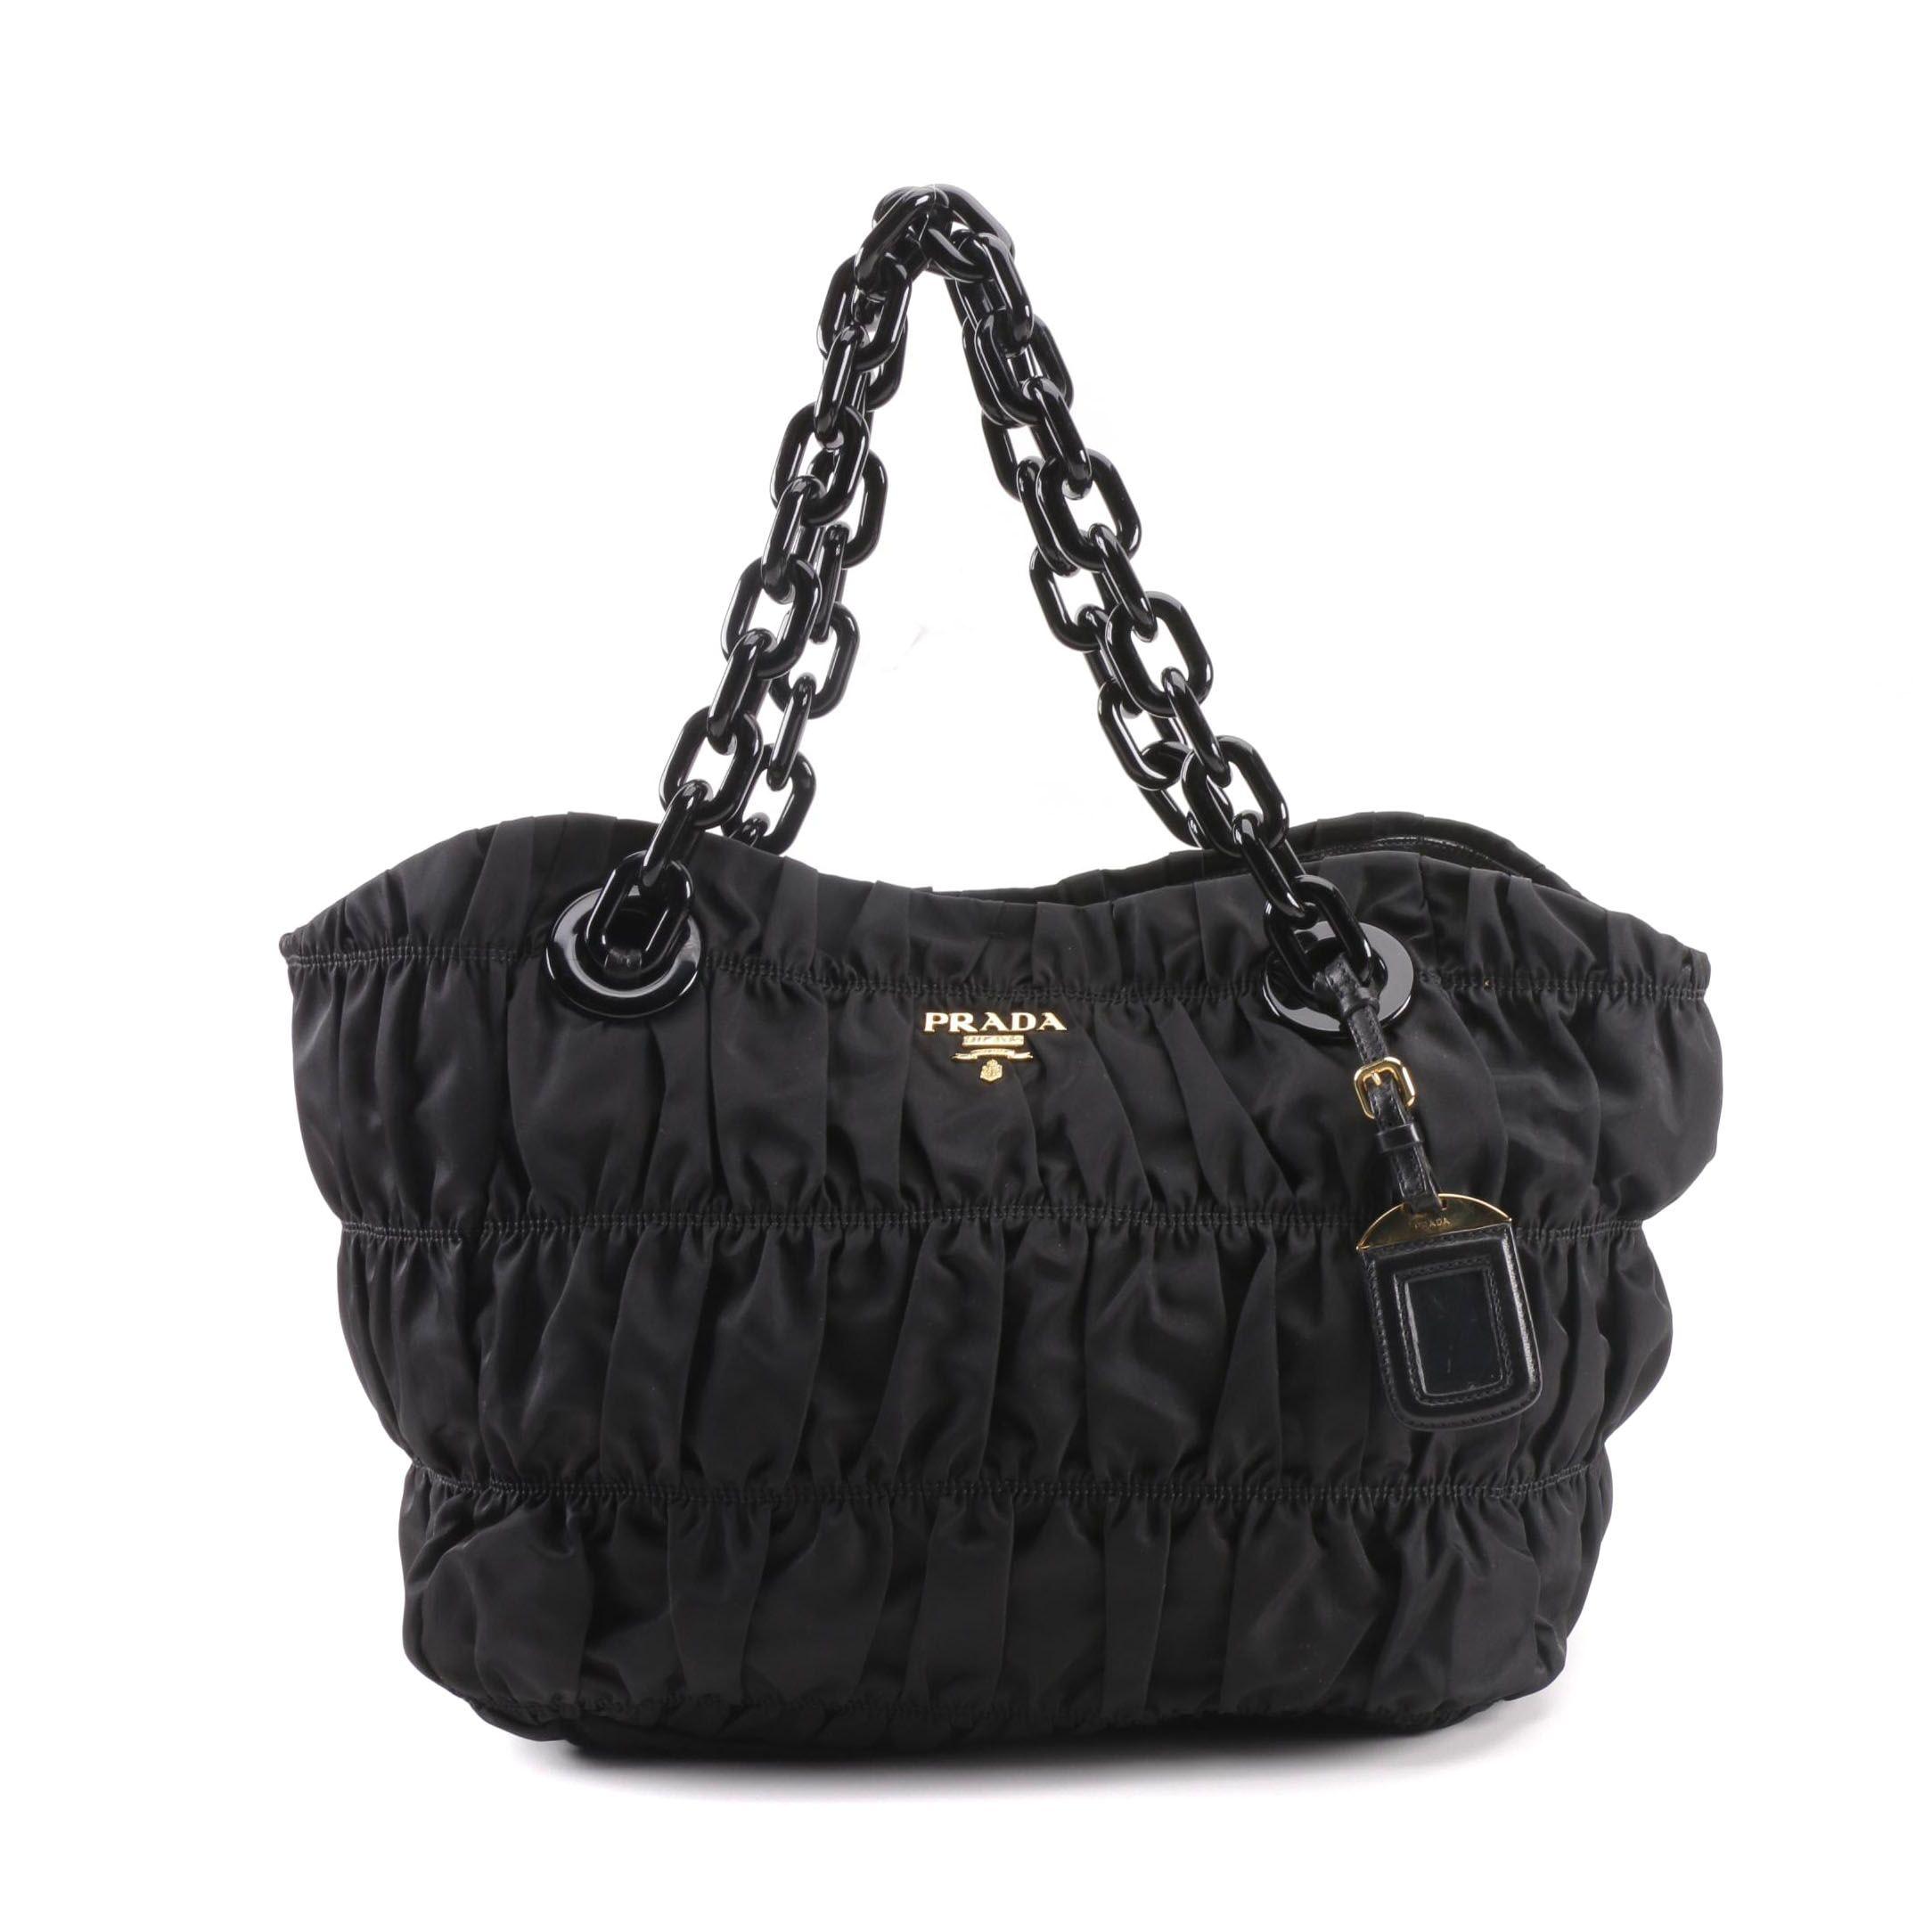 Prada Black Ruched Nylon Handbag